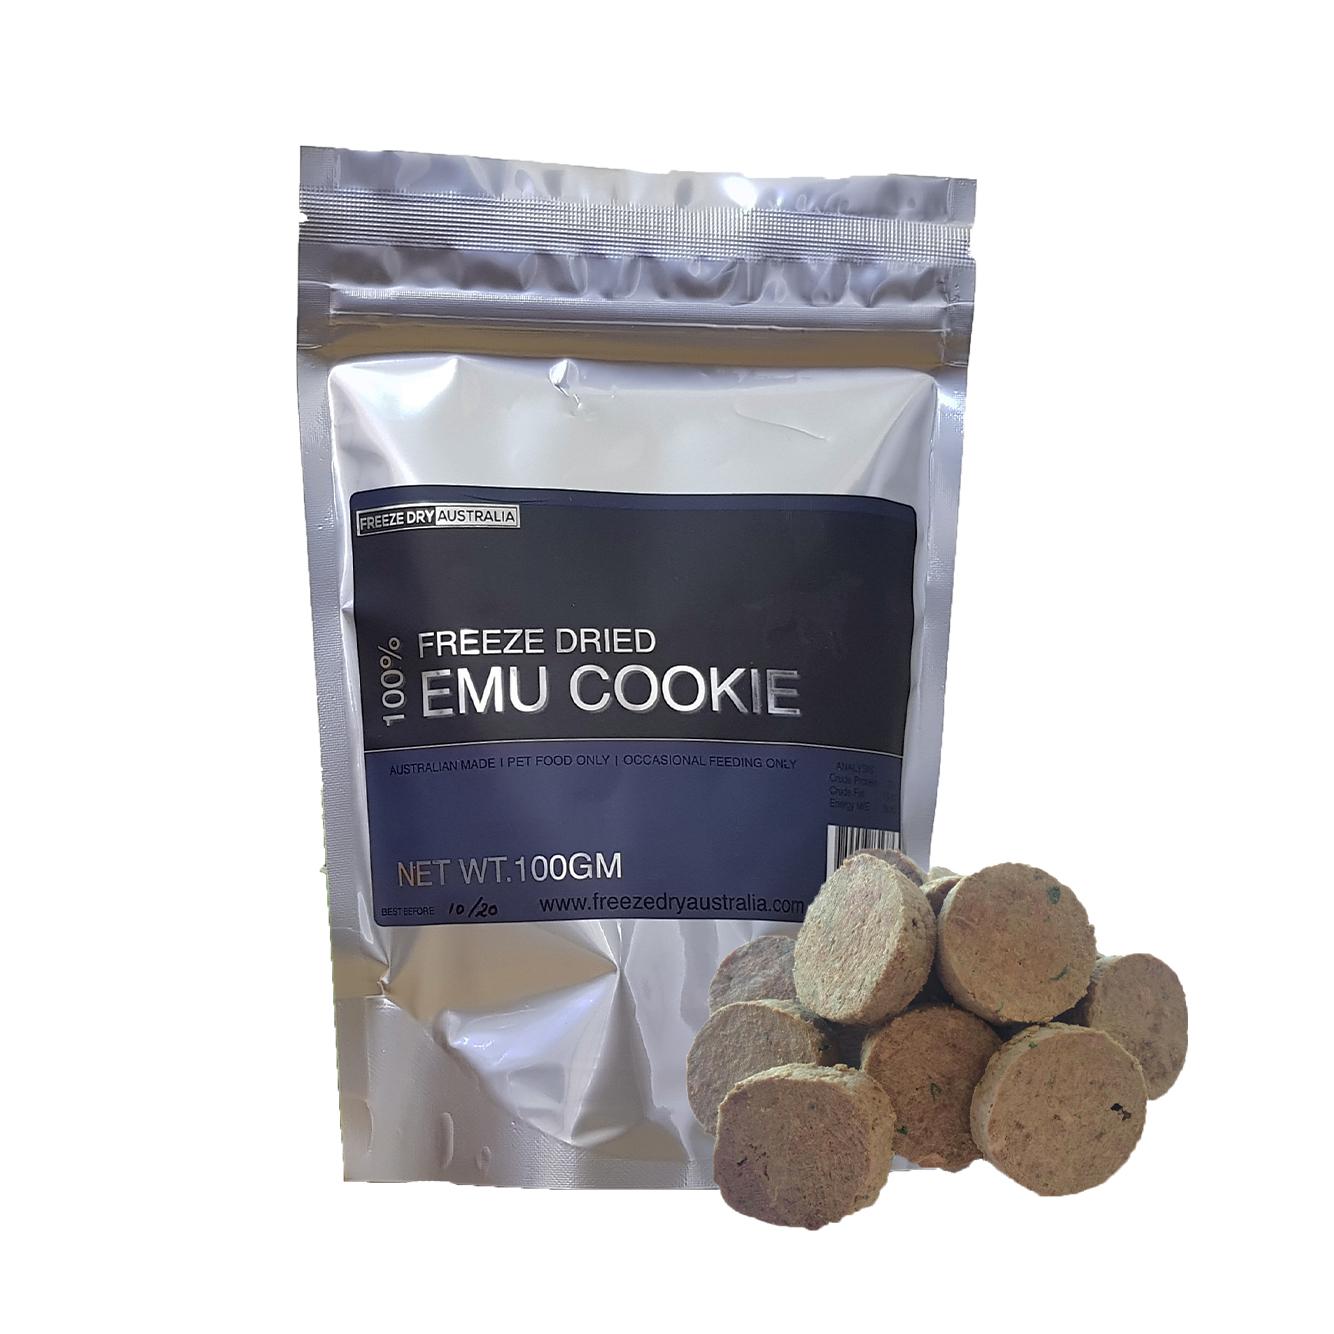 Emu Cookie